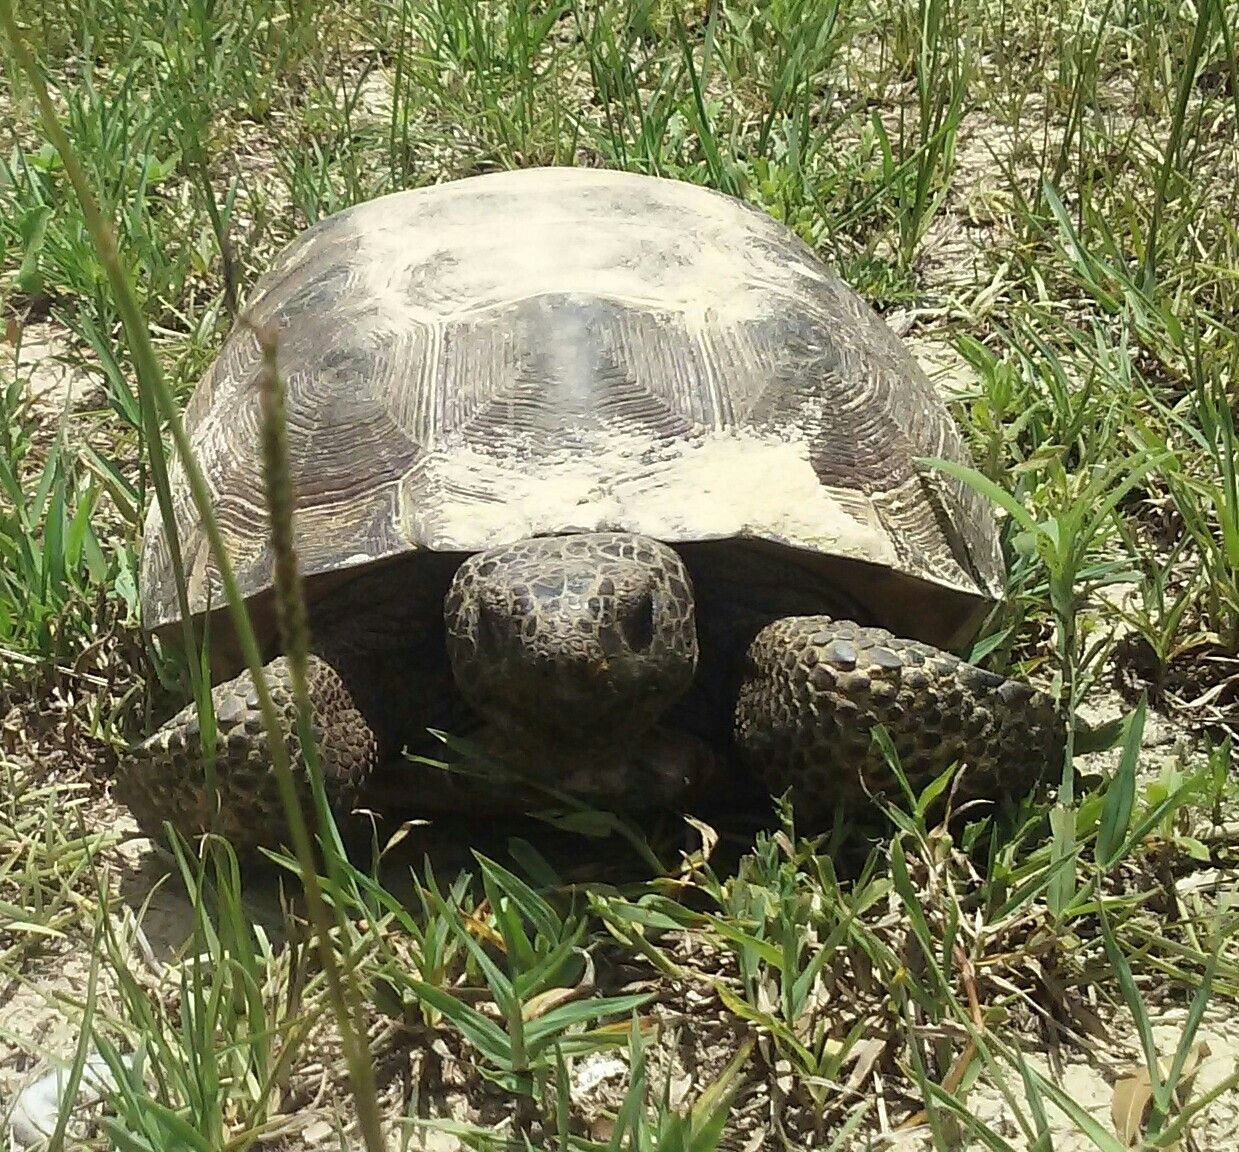 Gopher Tortoise in my yard on the Nature Coast, Florida